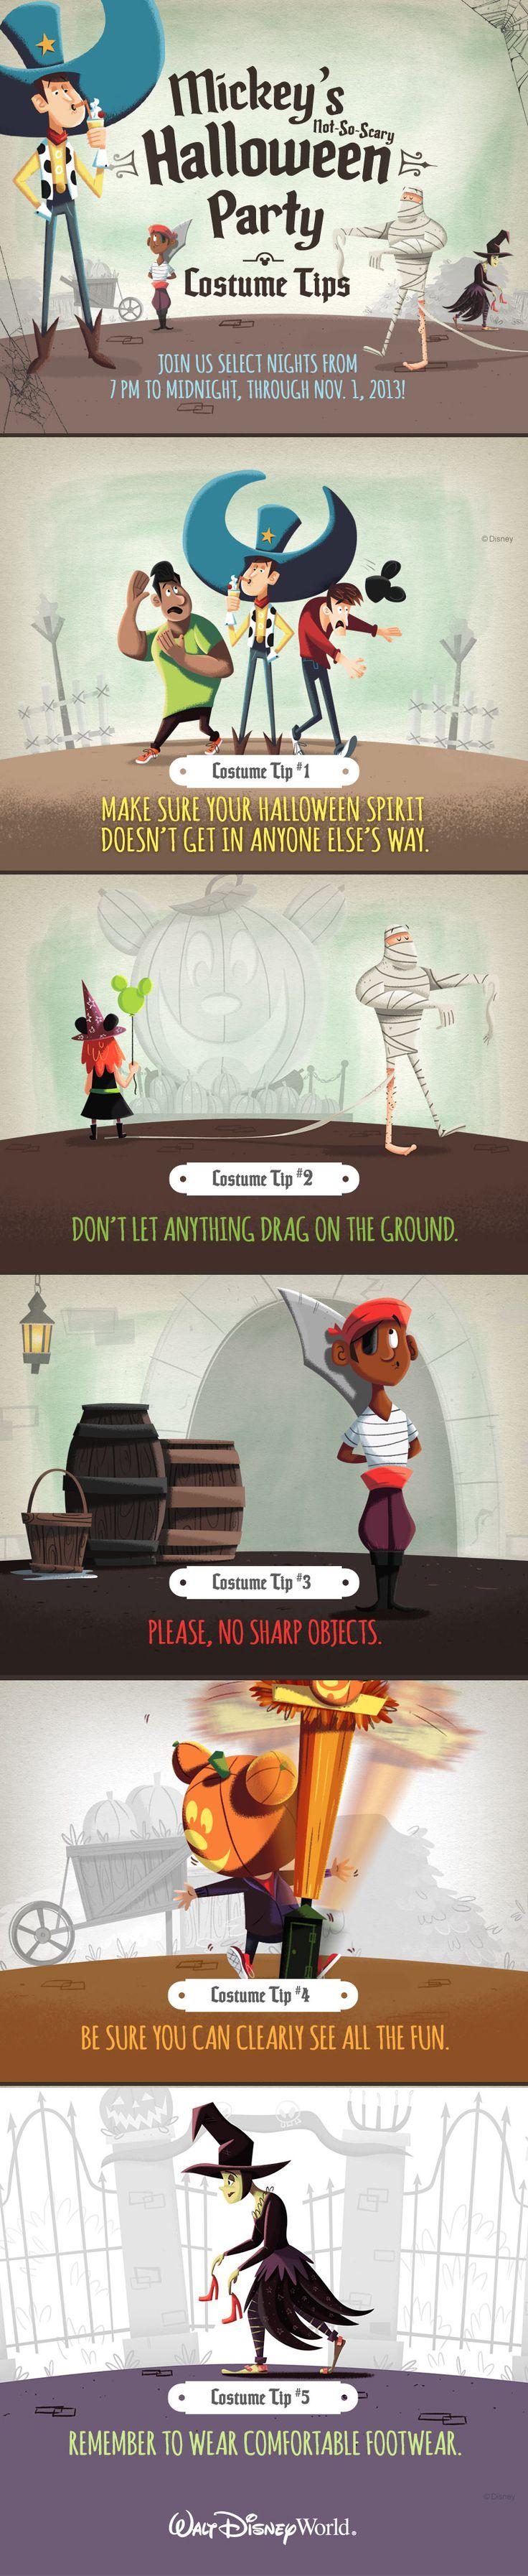 Best 20+ Halloween safety tips ideas on Pinterest   Costume for ...